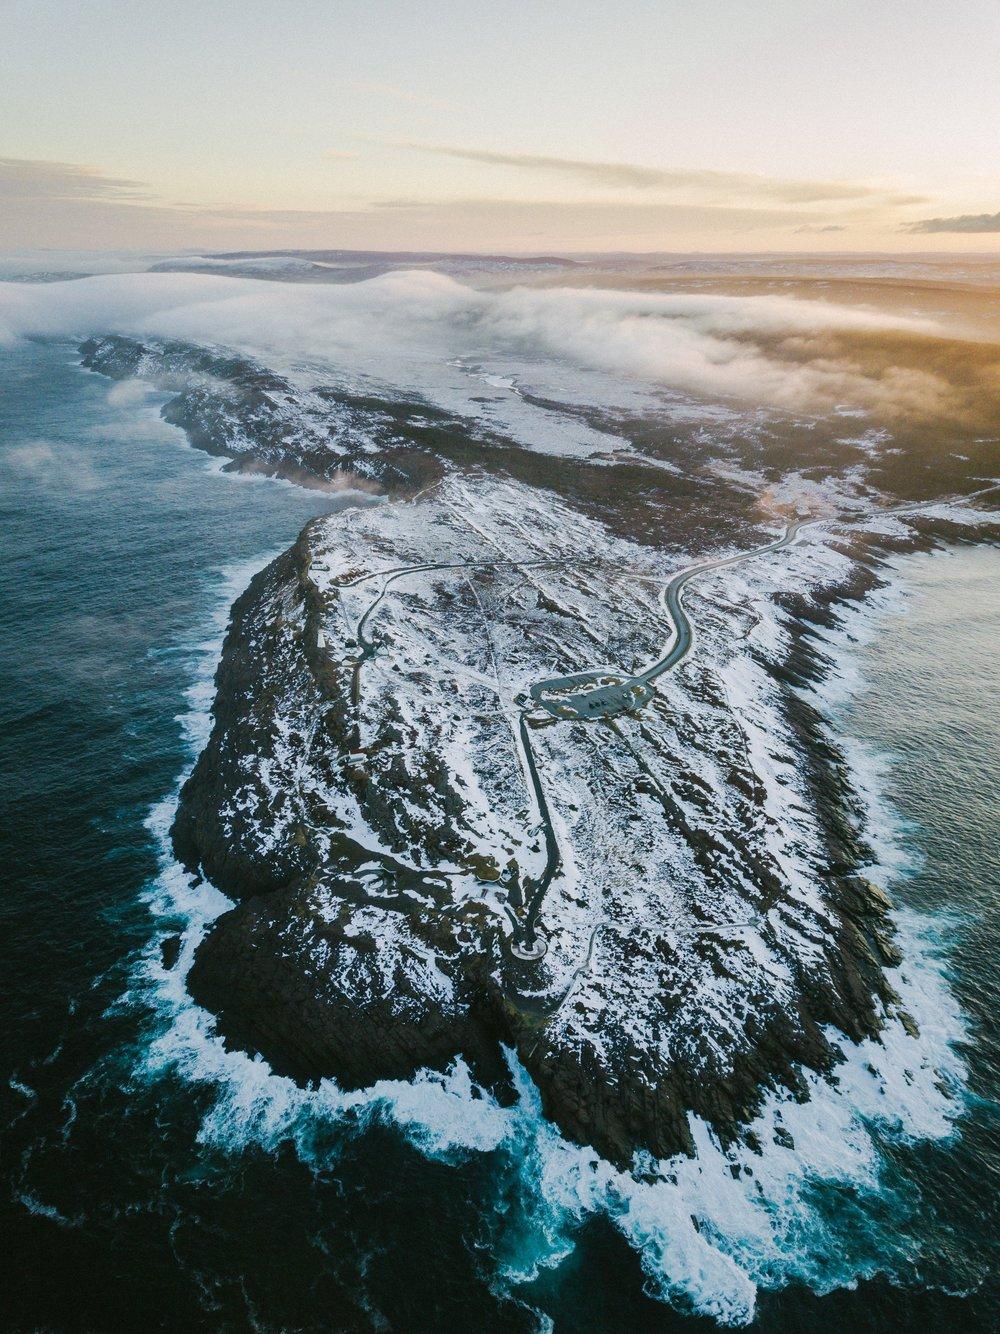 landscape_drone_photograhy_8.jpg